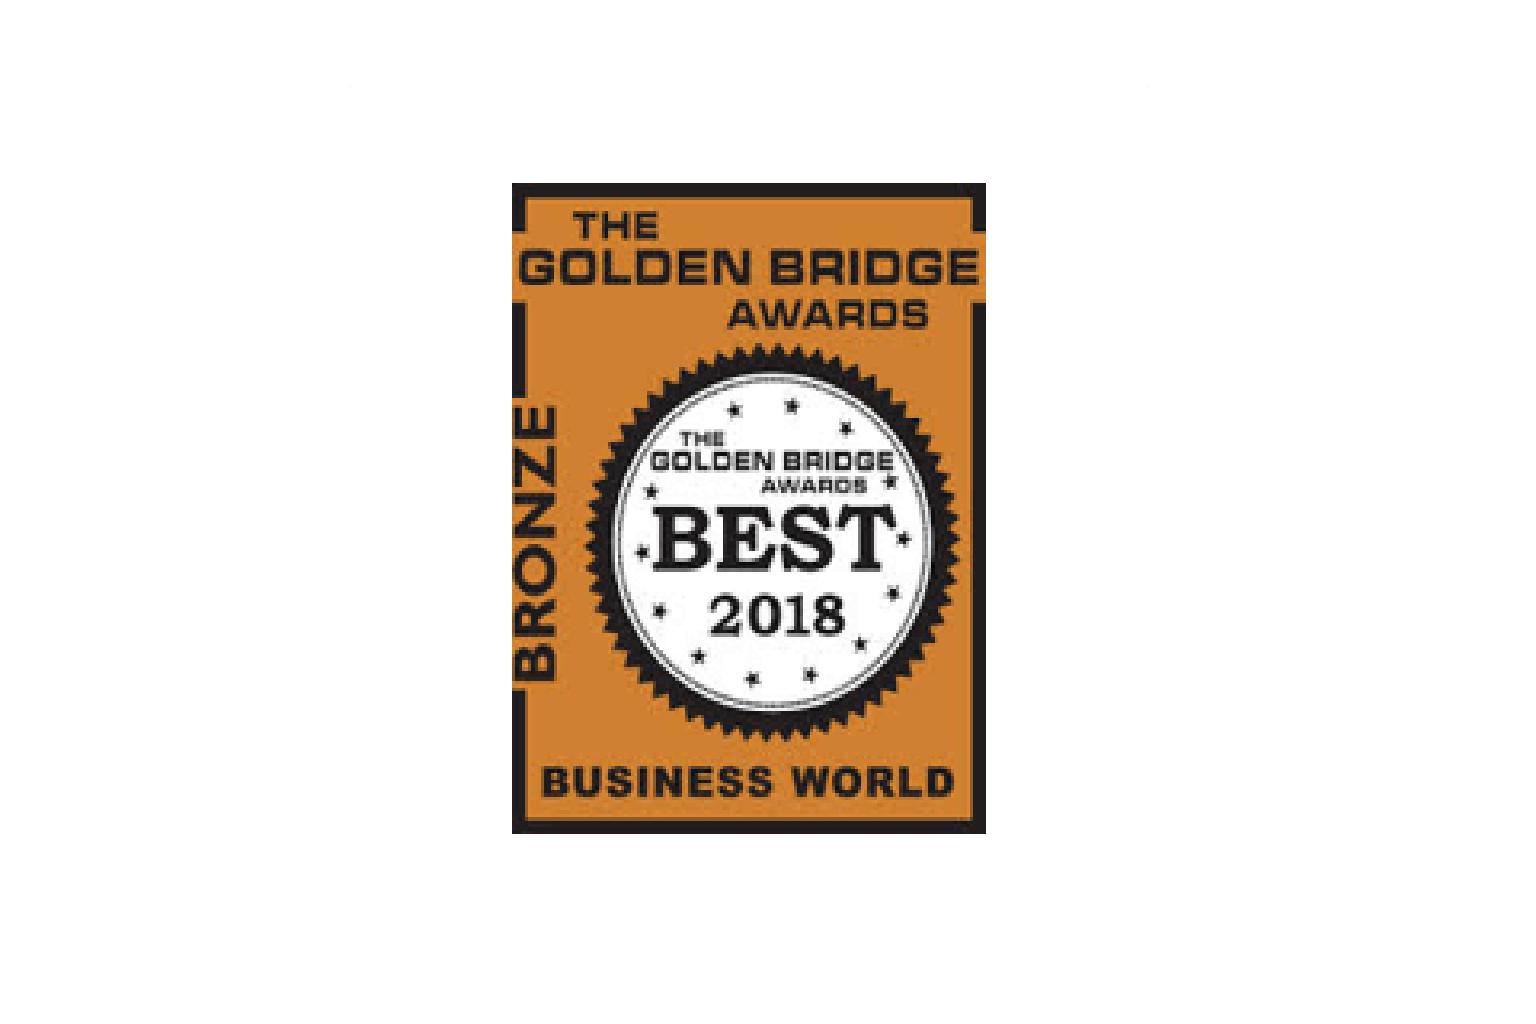 2018 Golden Bridge Awards image